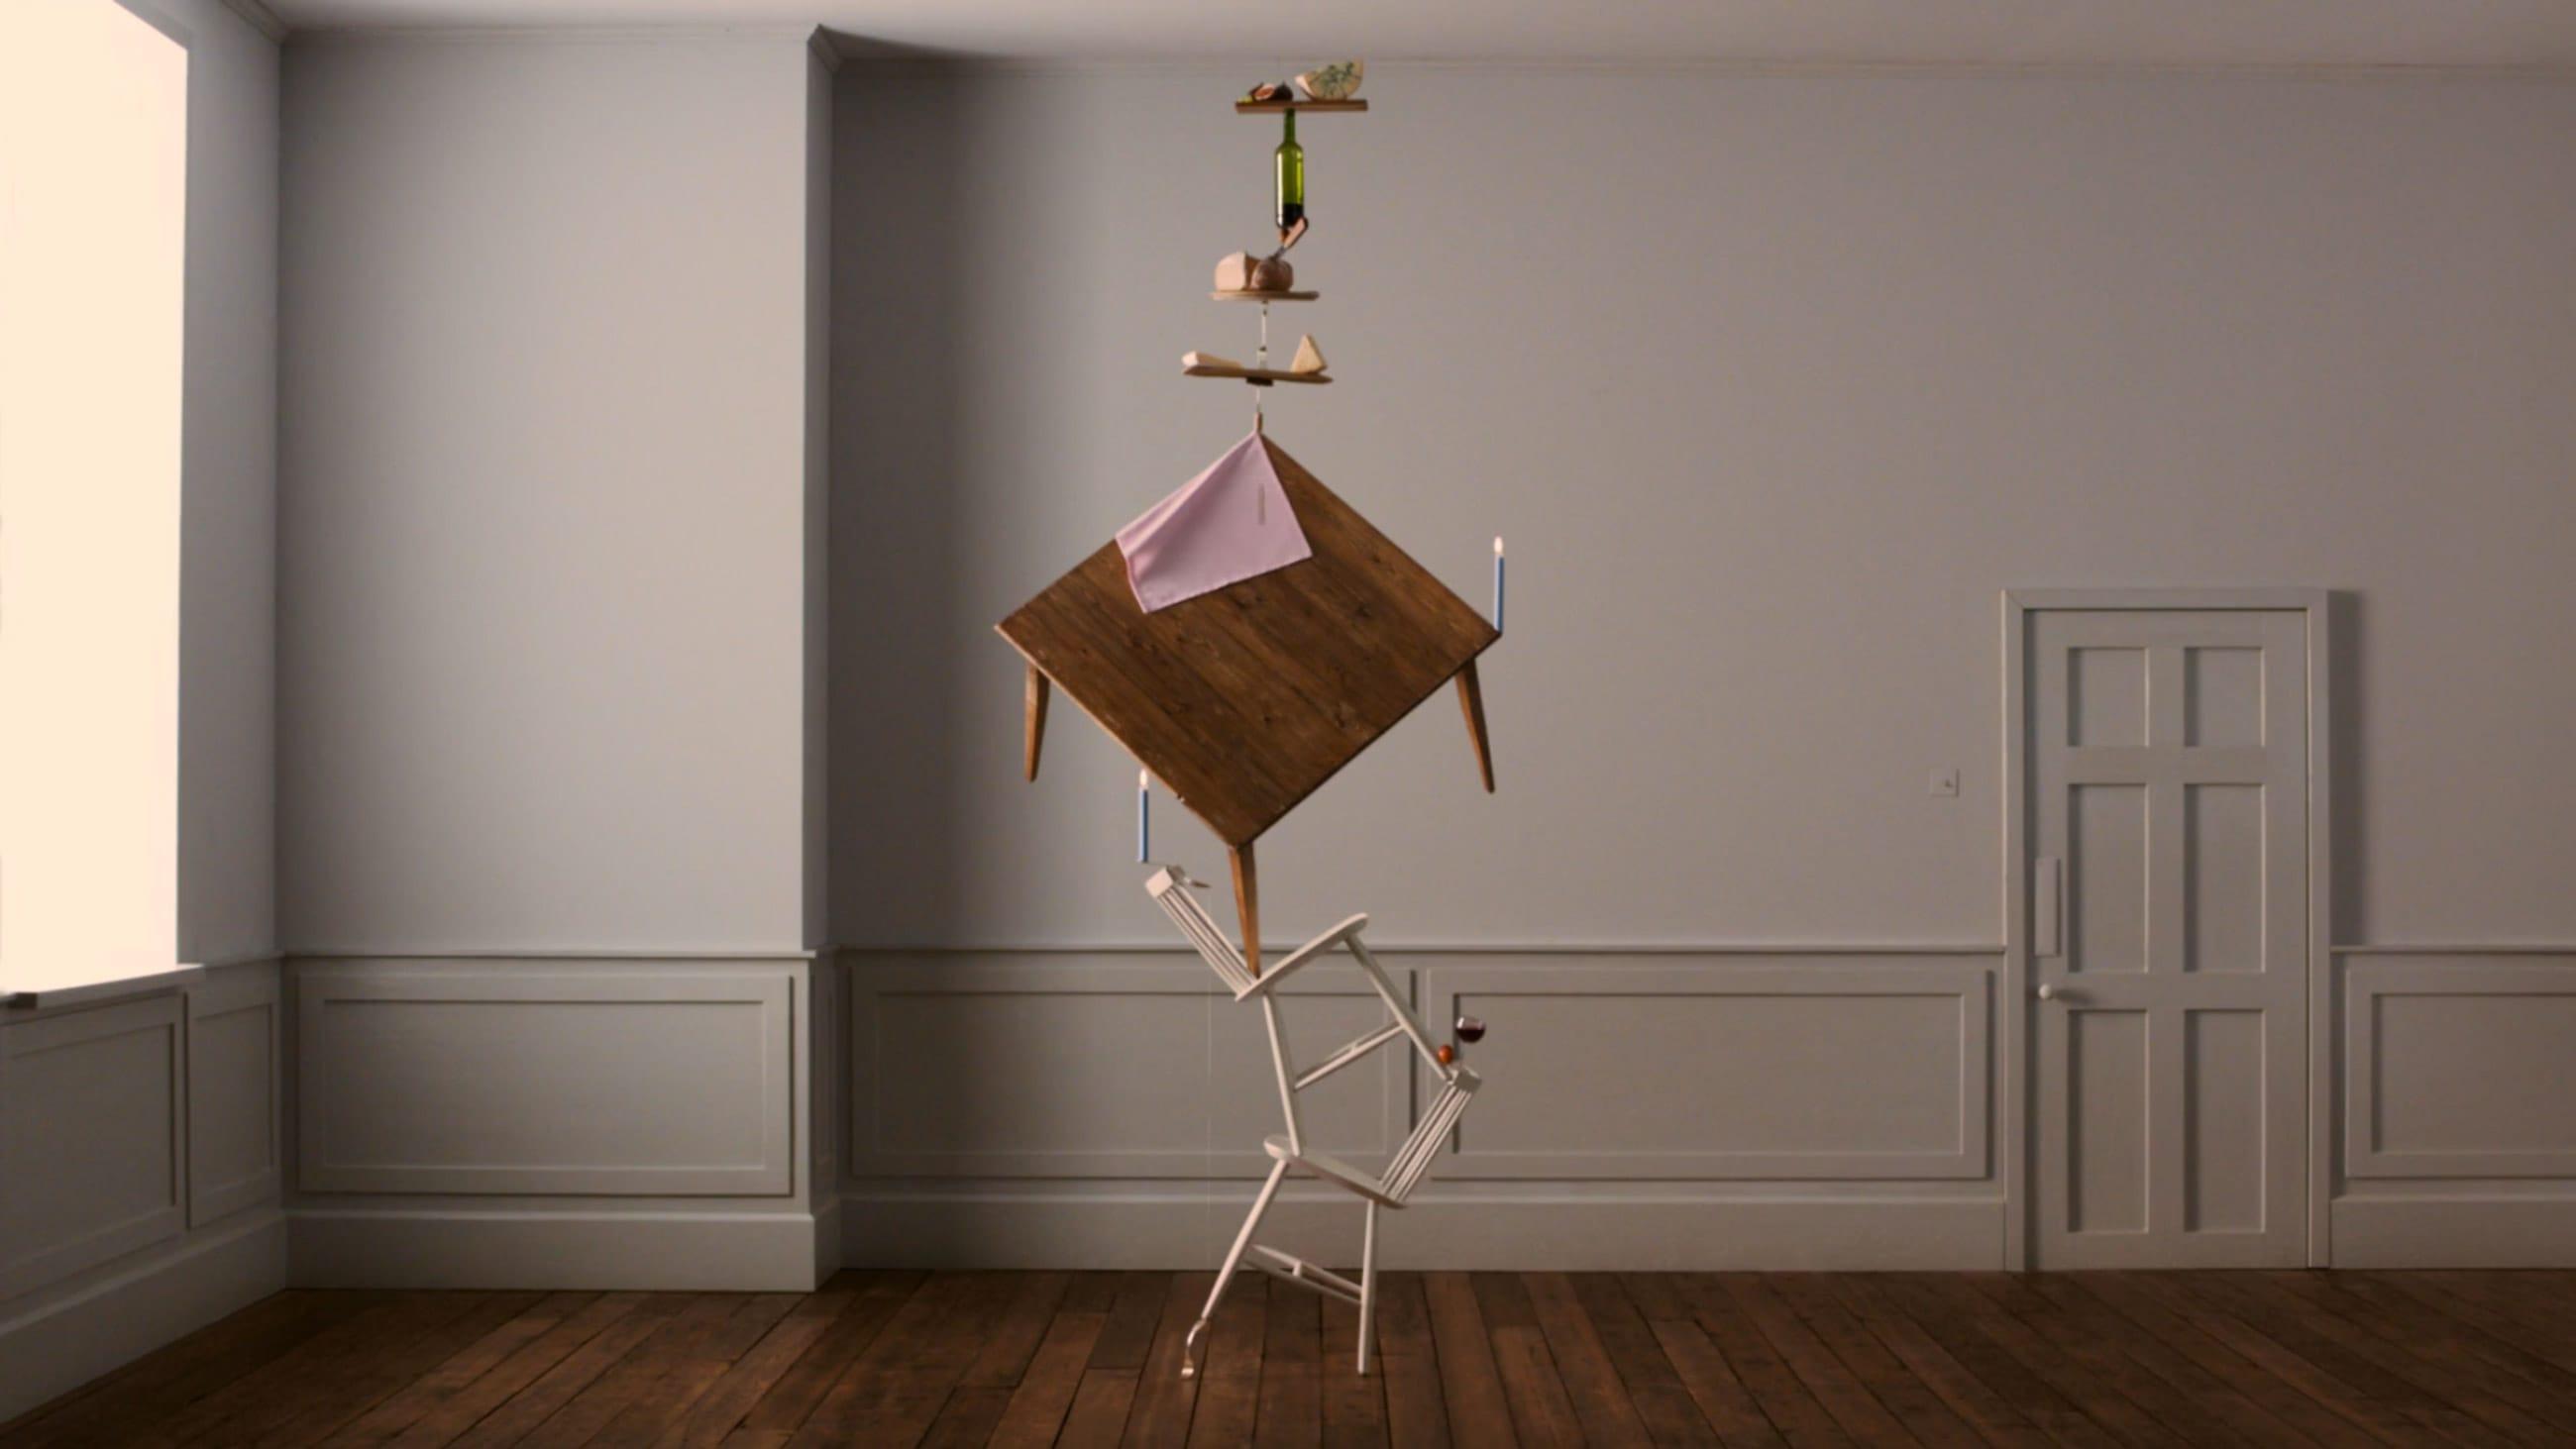 Studio Sander Plug – Castello